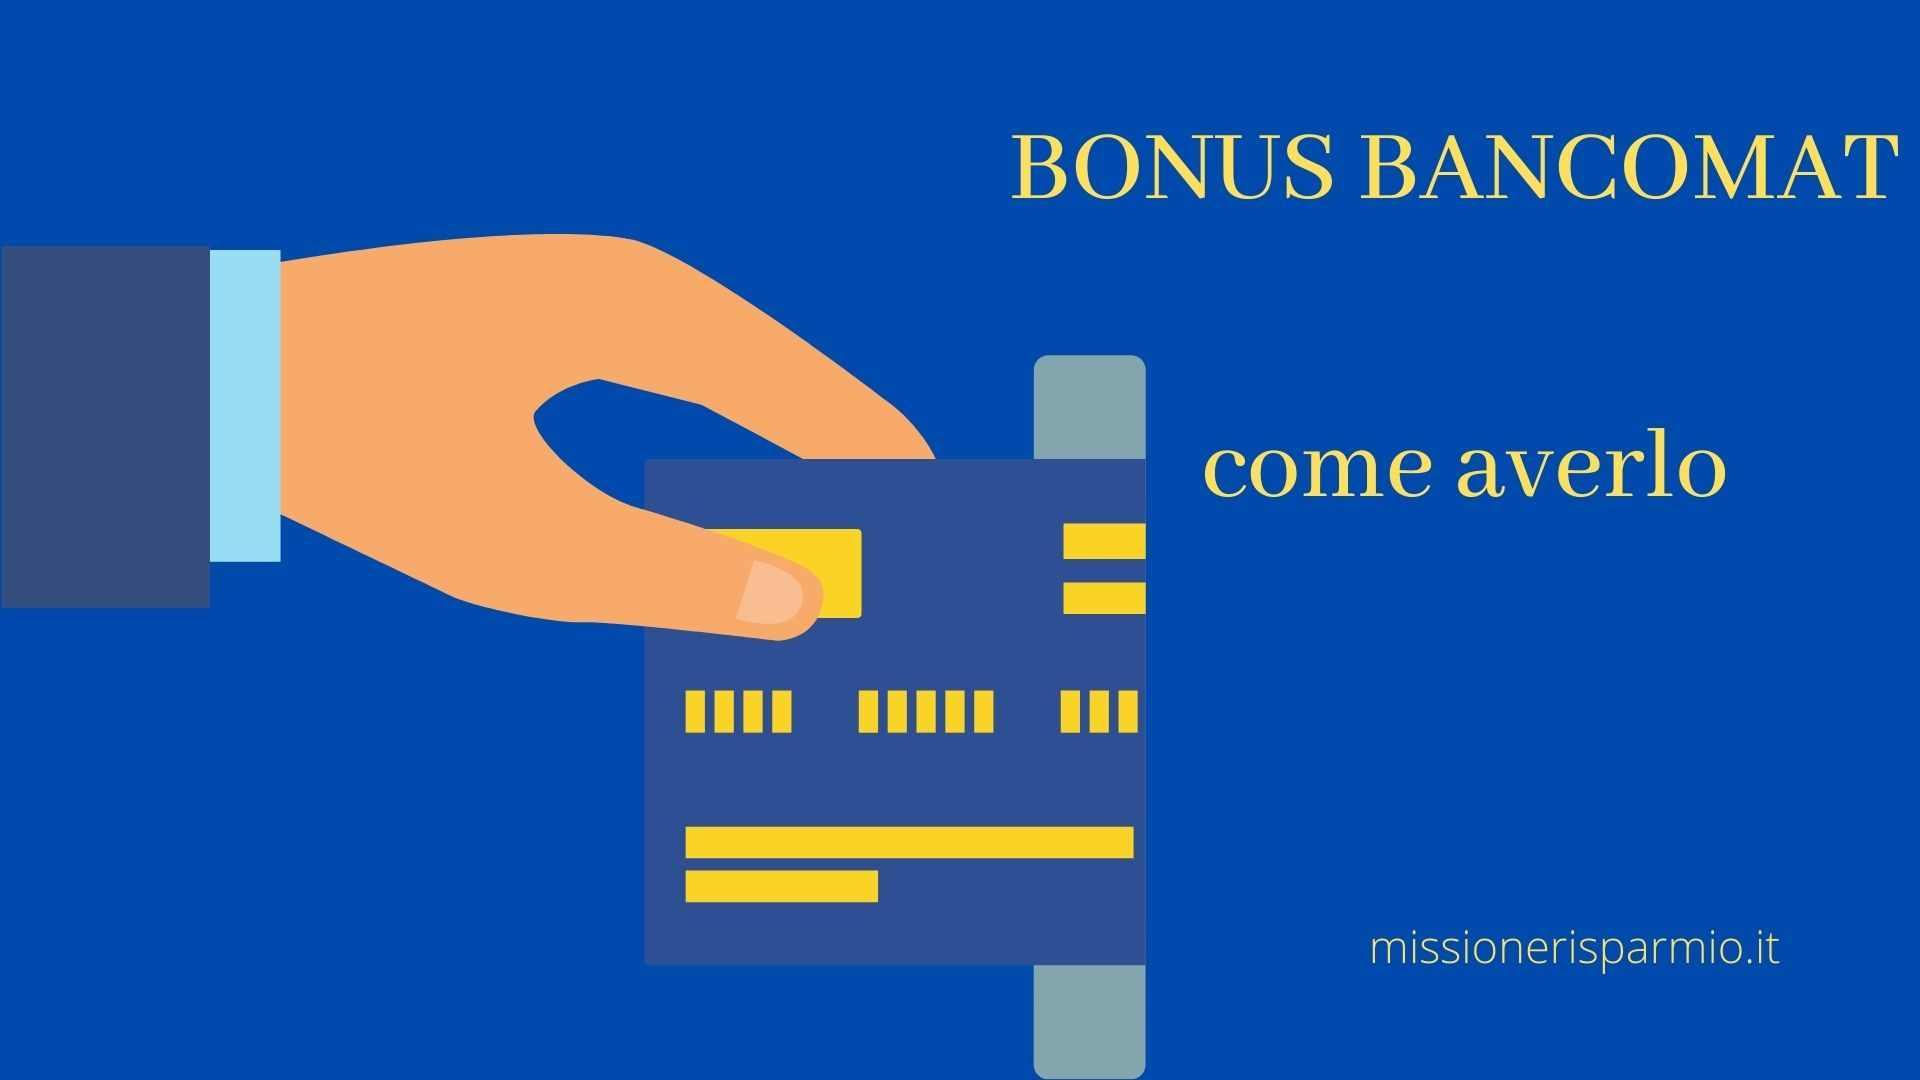 Arriva il Bonus bancomat da 480 euro